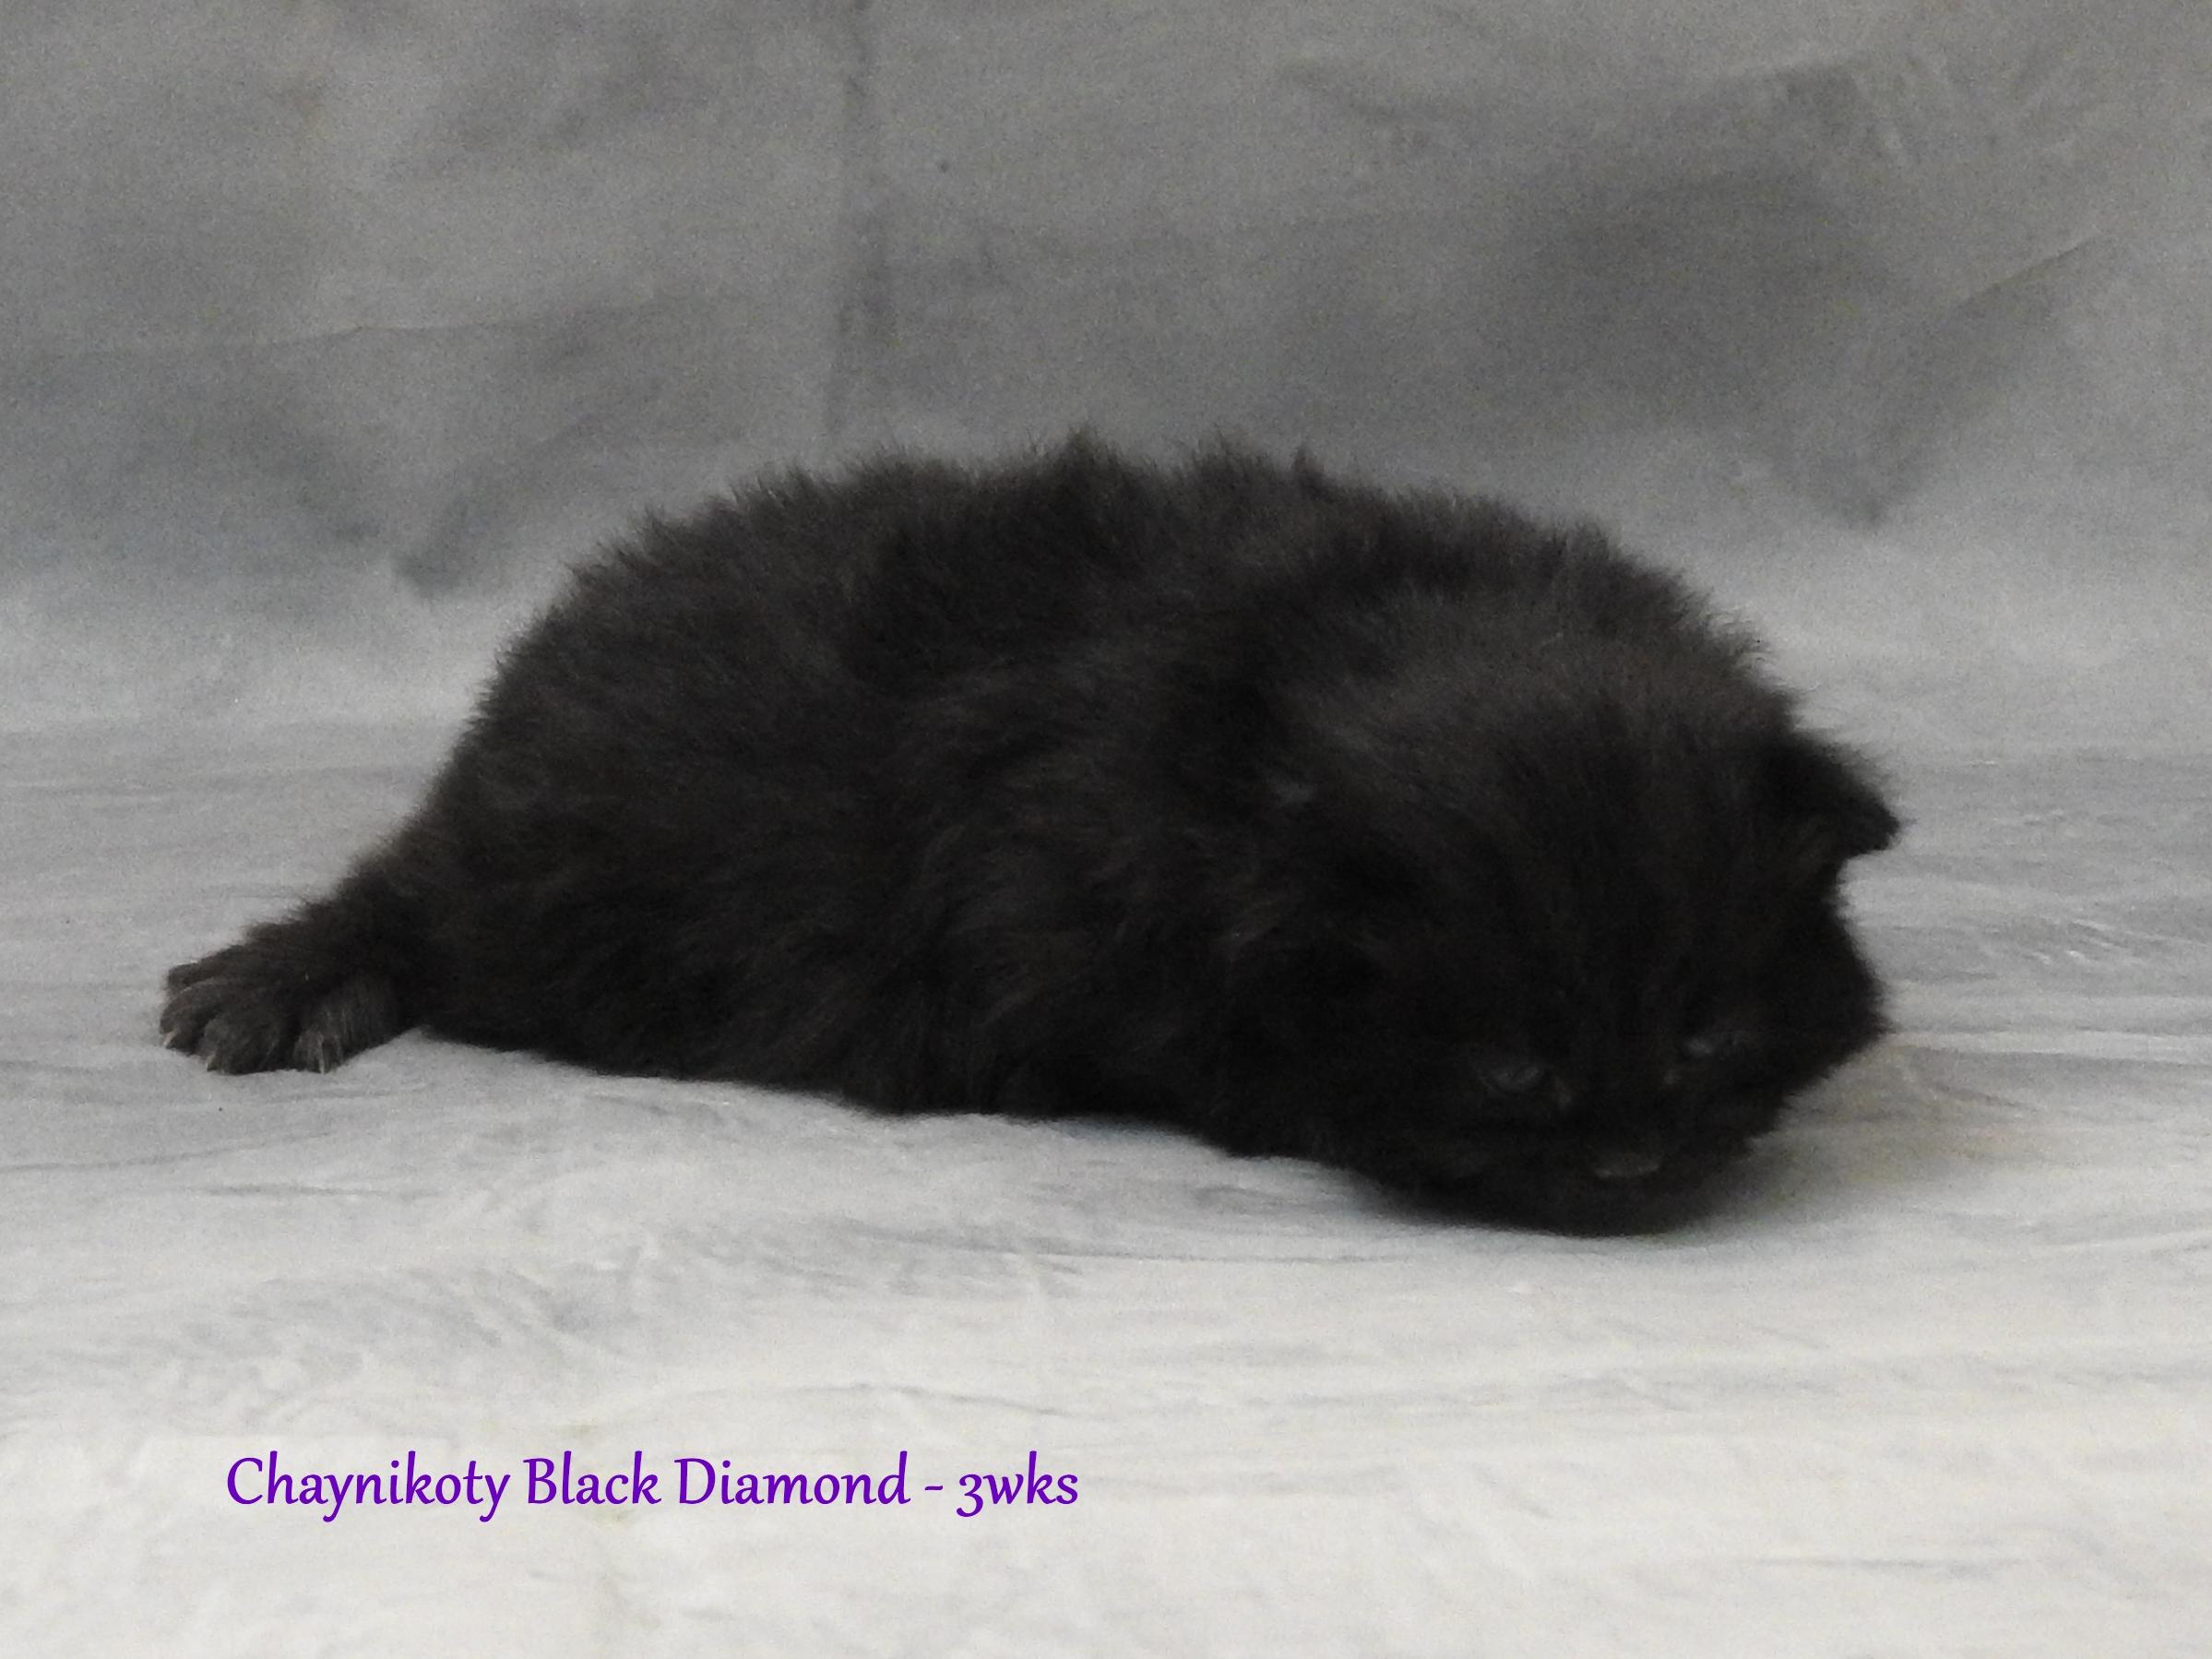 Chaynikoty Black Diamond